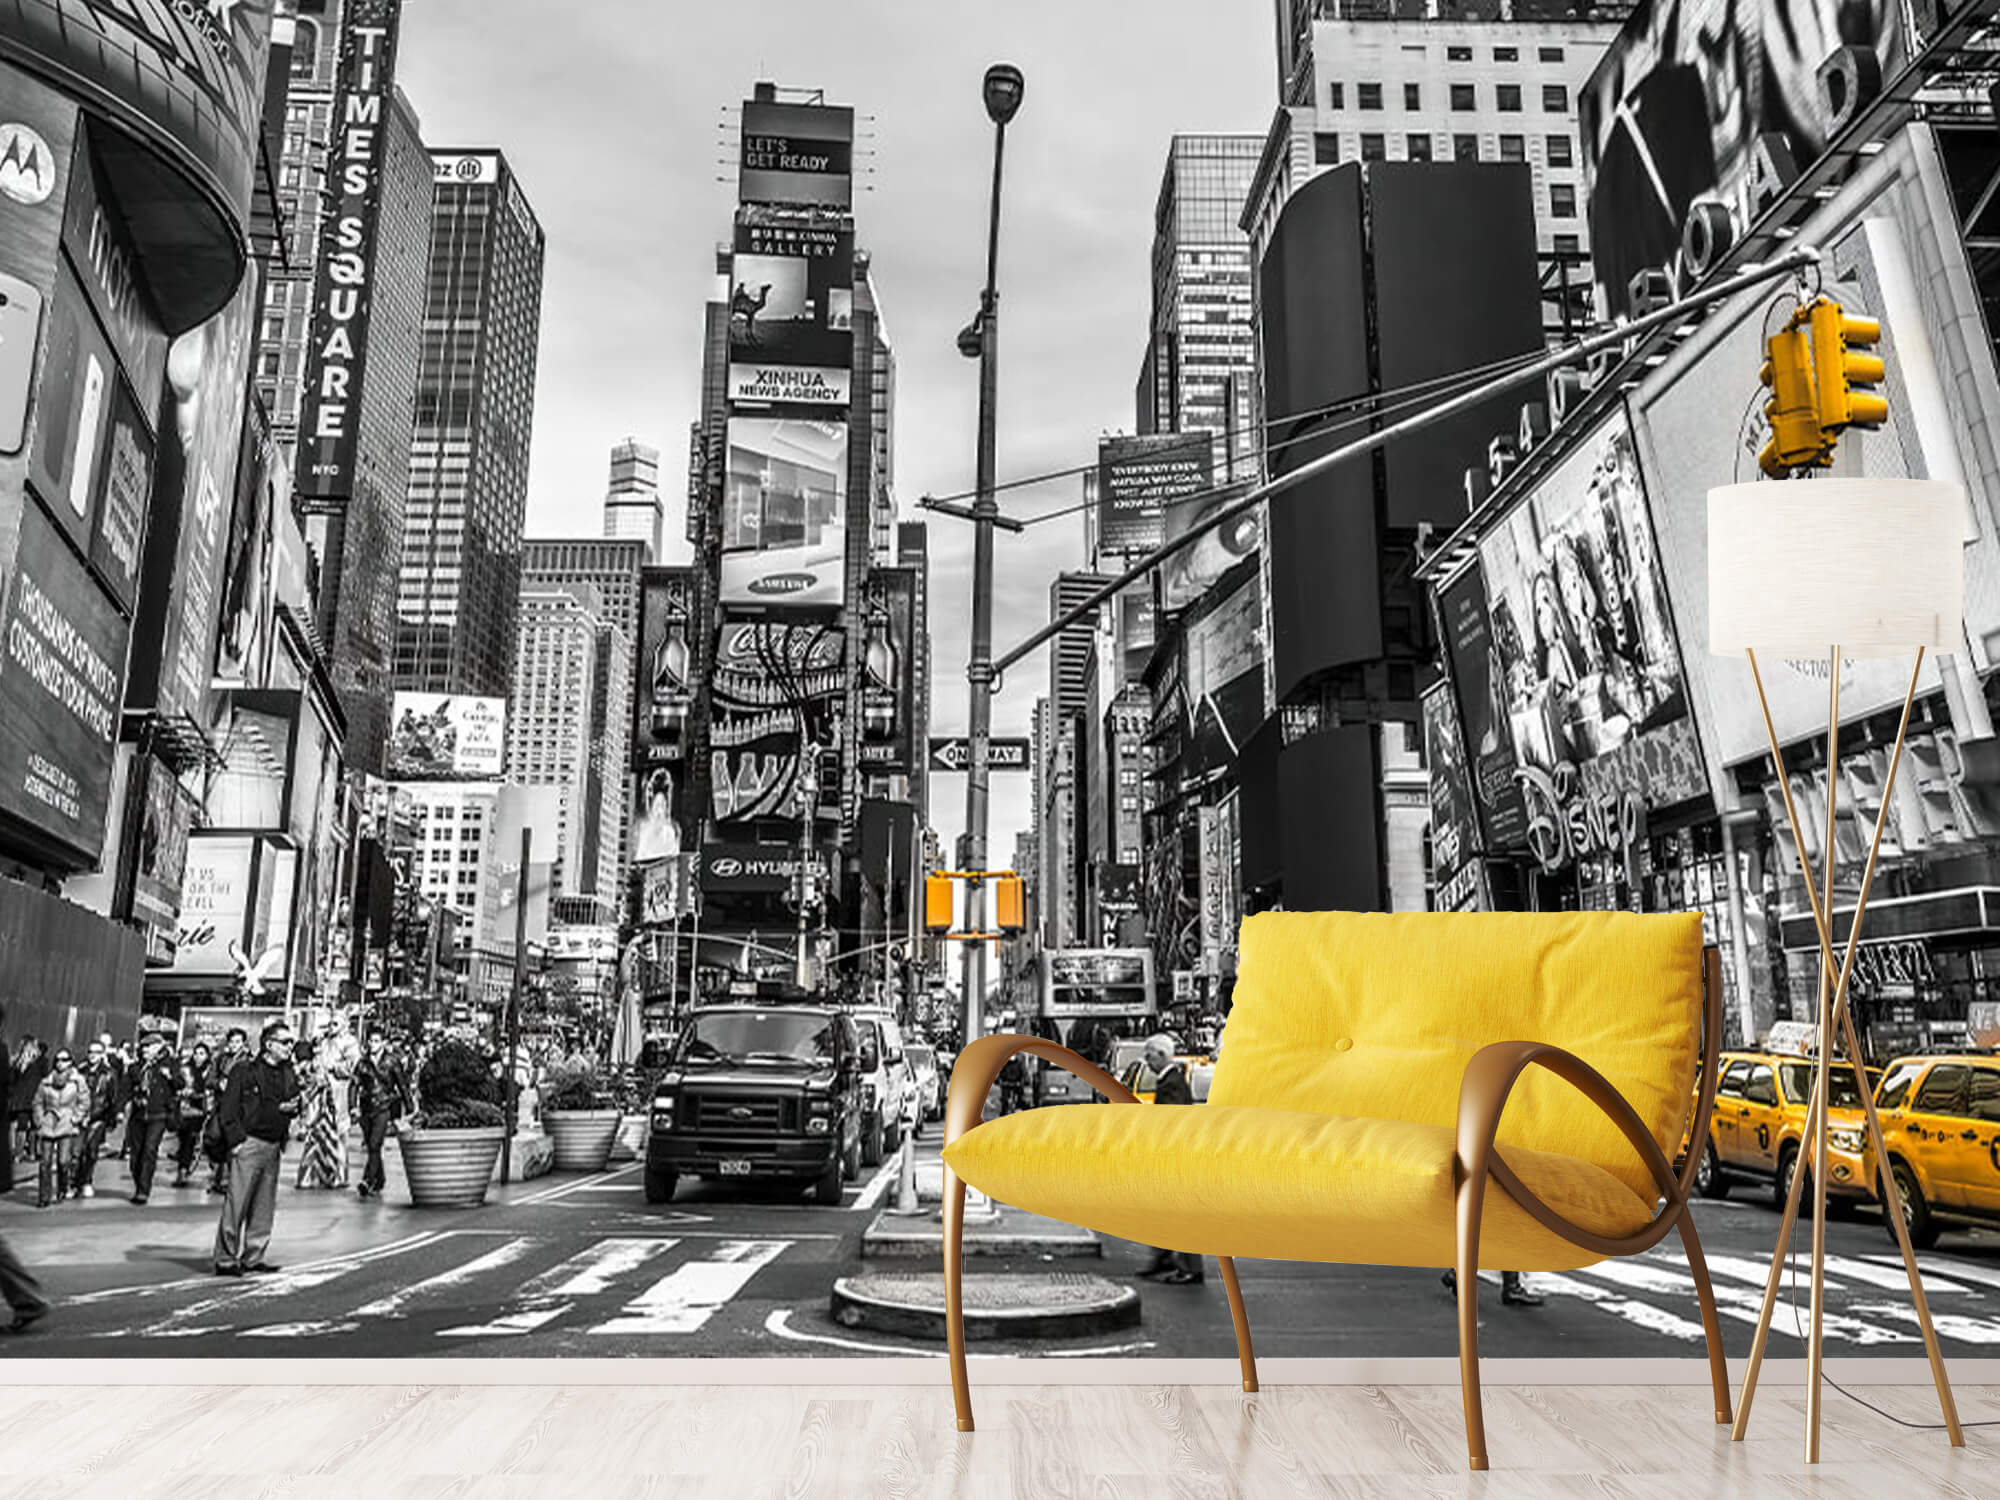 Broadway Times Square 7